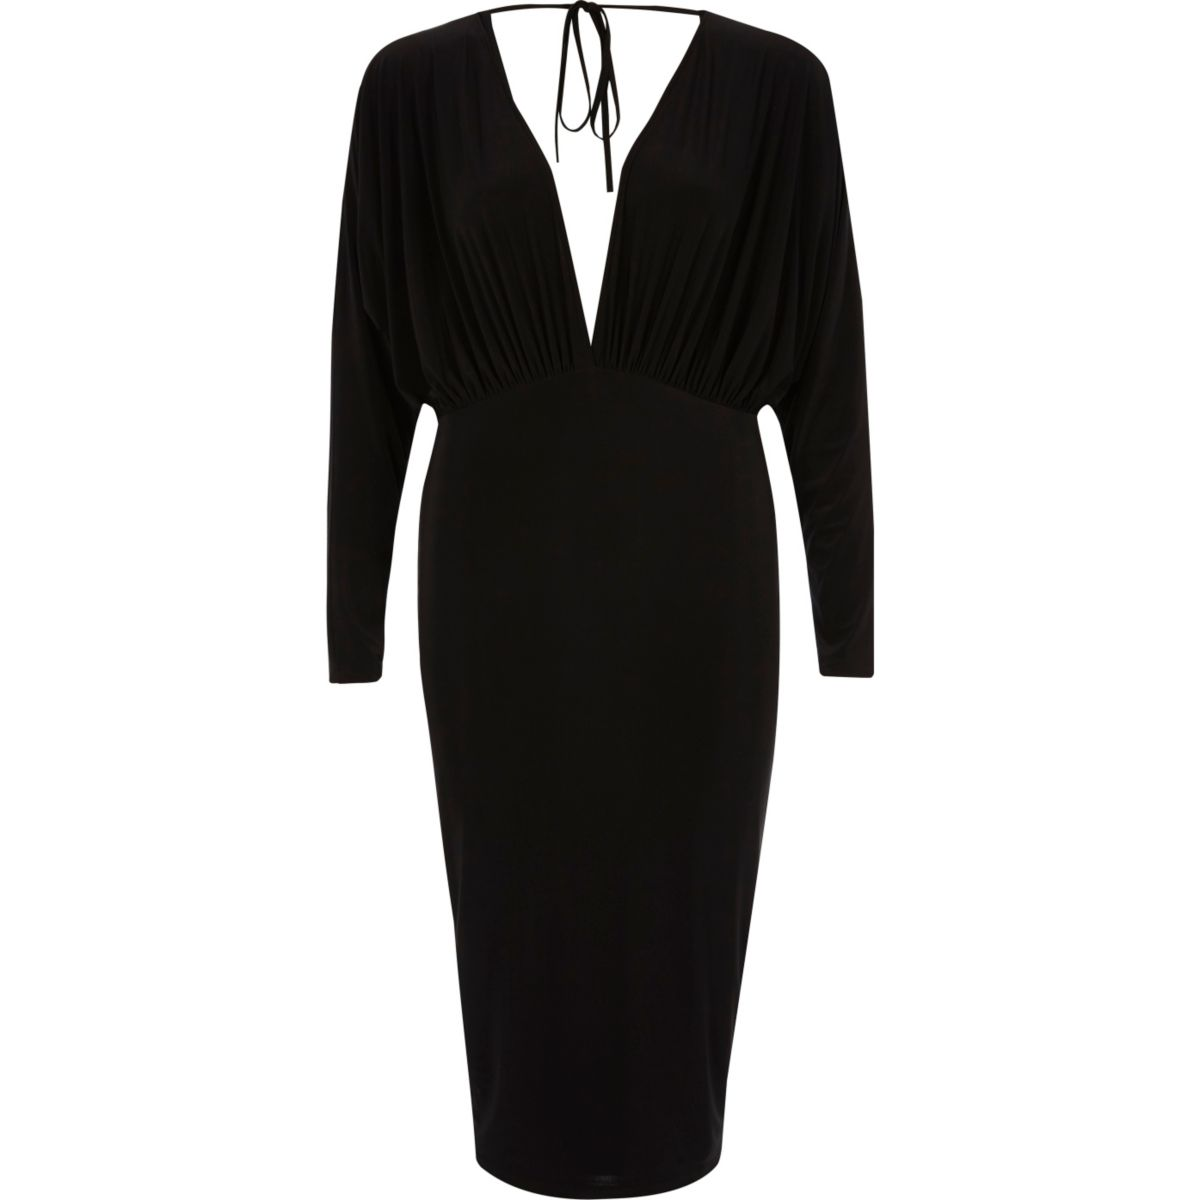 Zwarte bodycon midi-jurk met vleermuismouw en decolleté